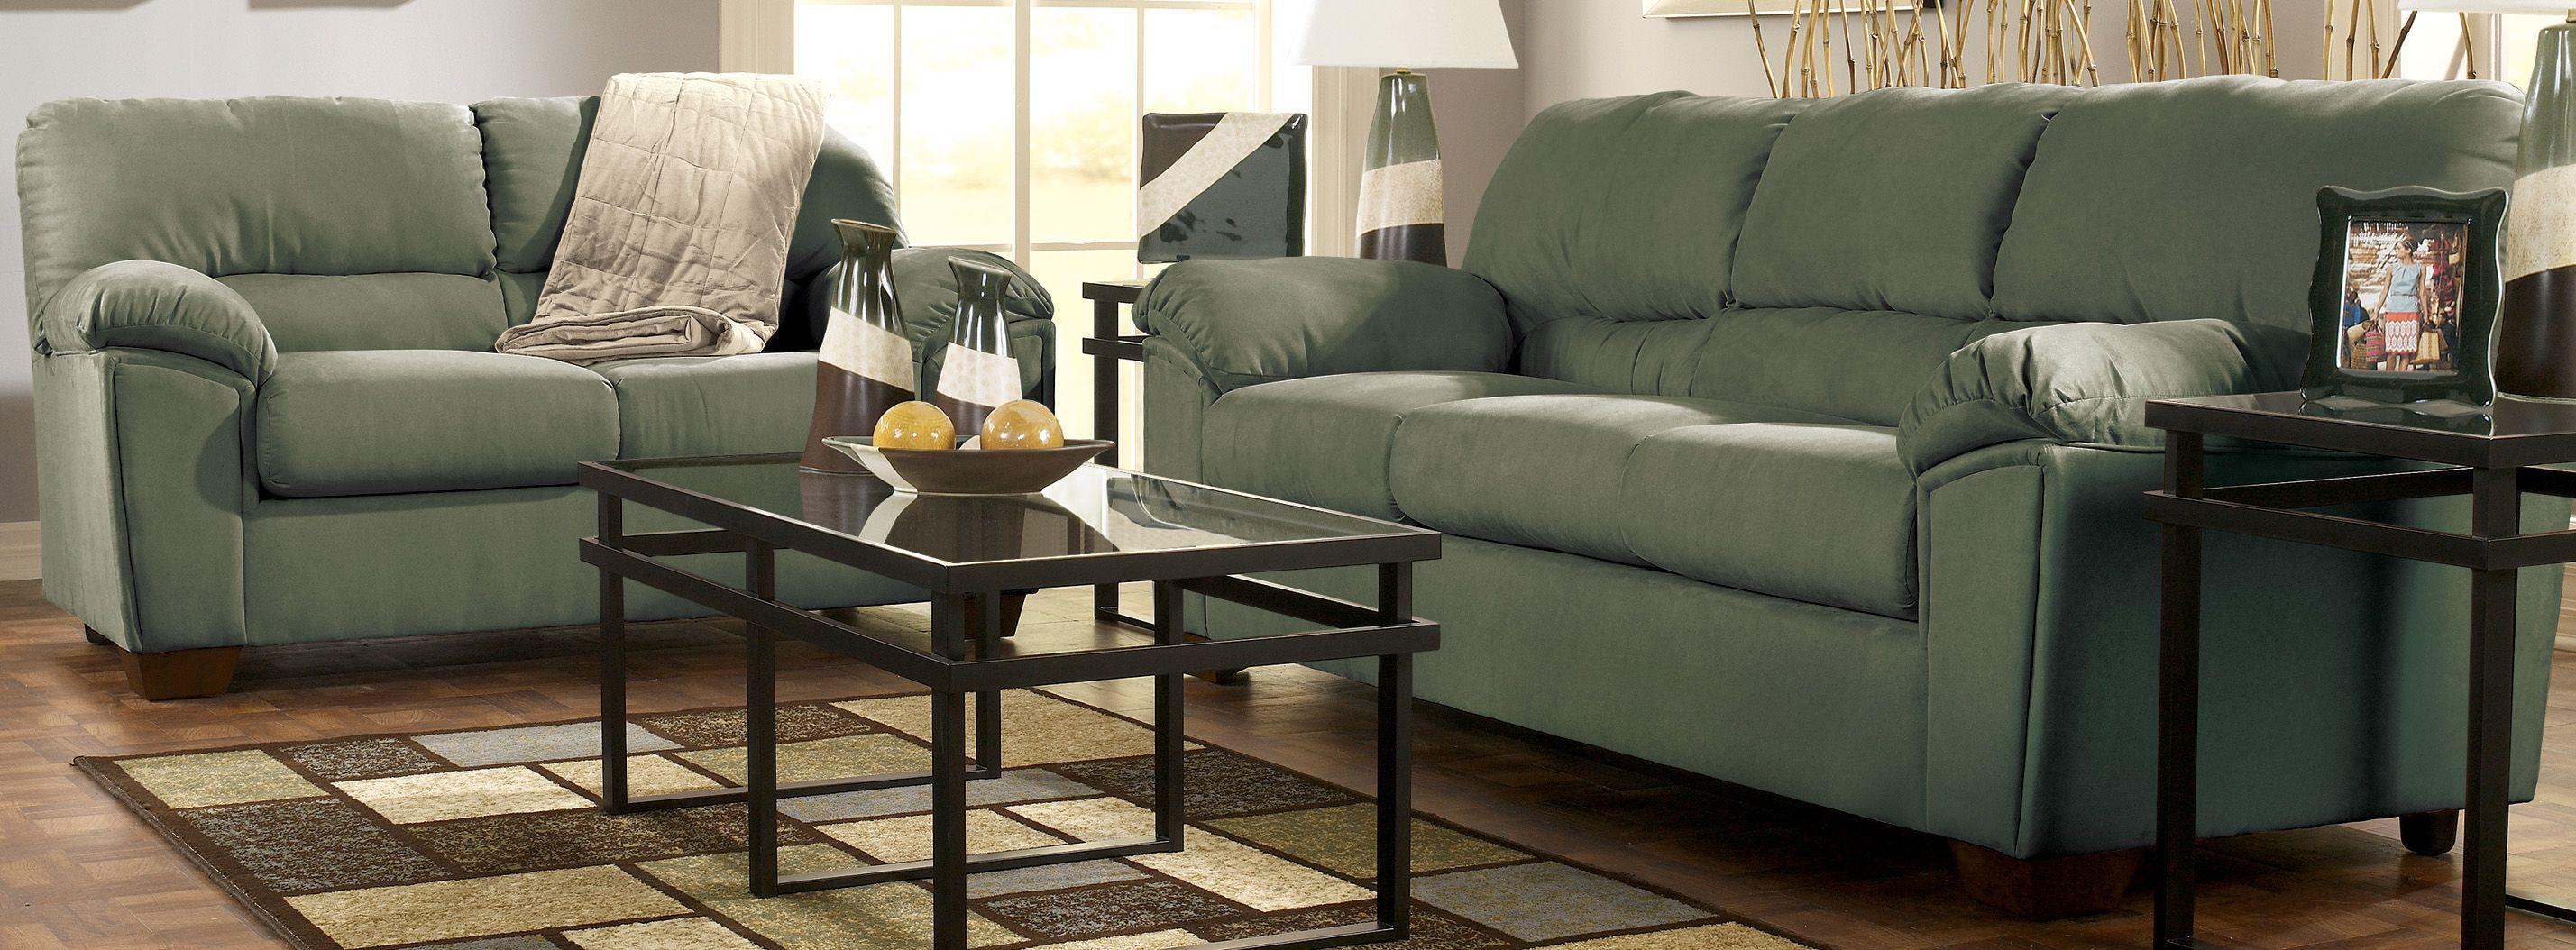 Furnitureimpressive Cheap Living Room Sectionals Sofa In Brown Simple Cheap Living Room Sets Under 300 Decorating Design